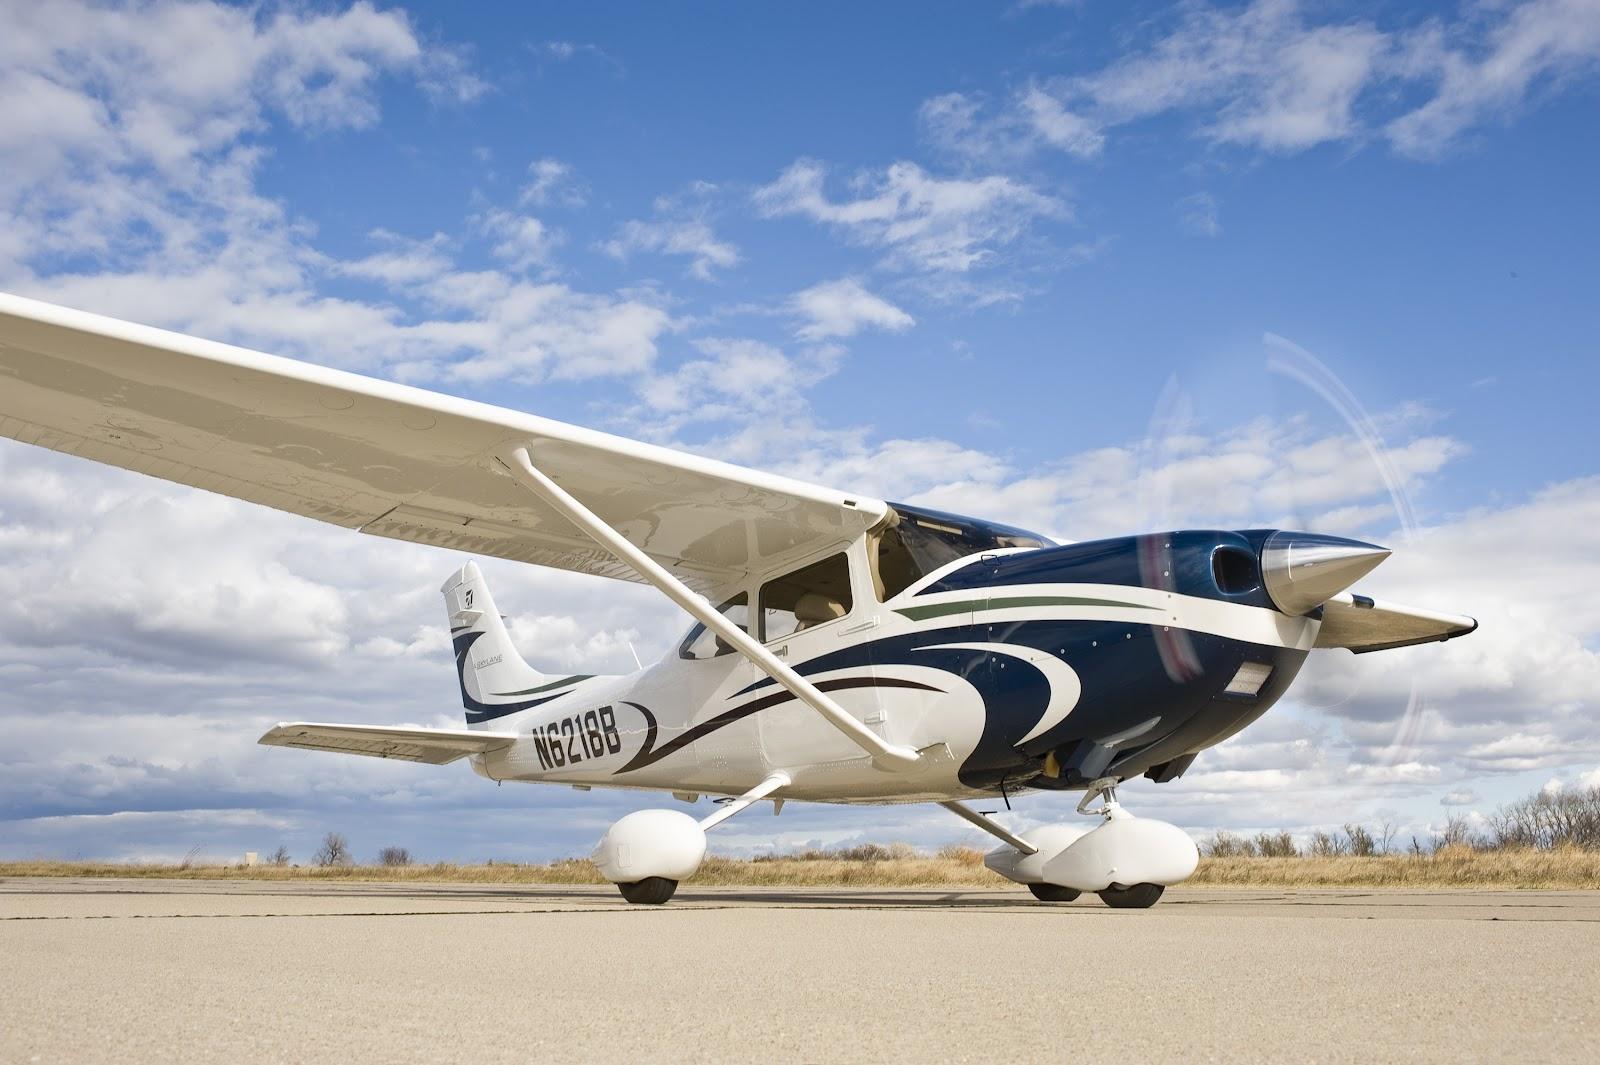 Cessna 182 The Skylane Aircraft Wallpaper 2321 Aeronefnet